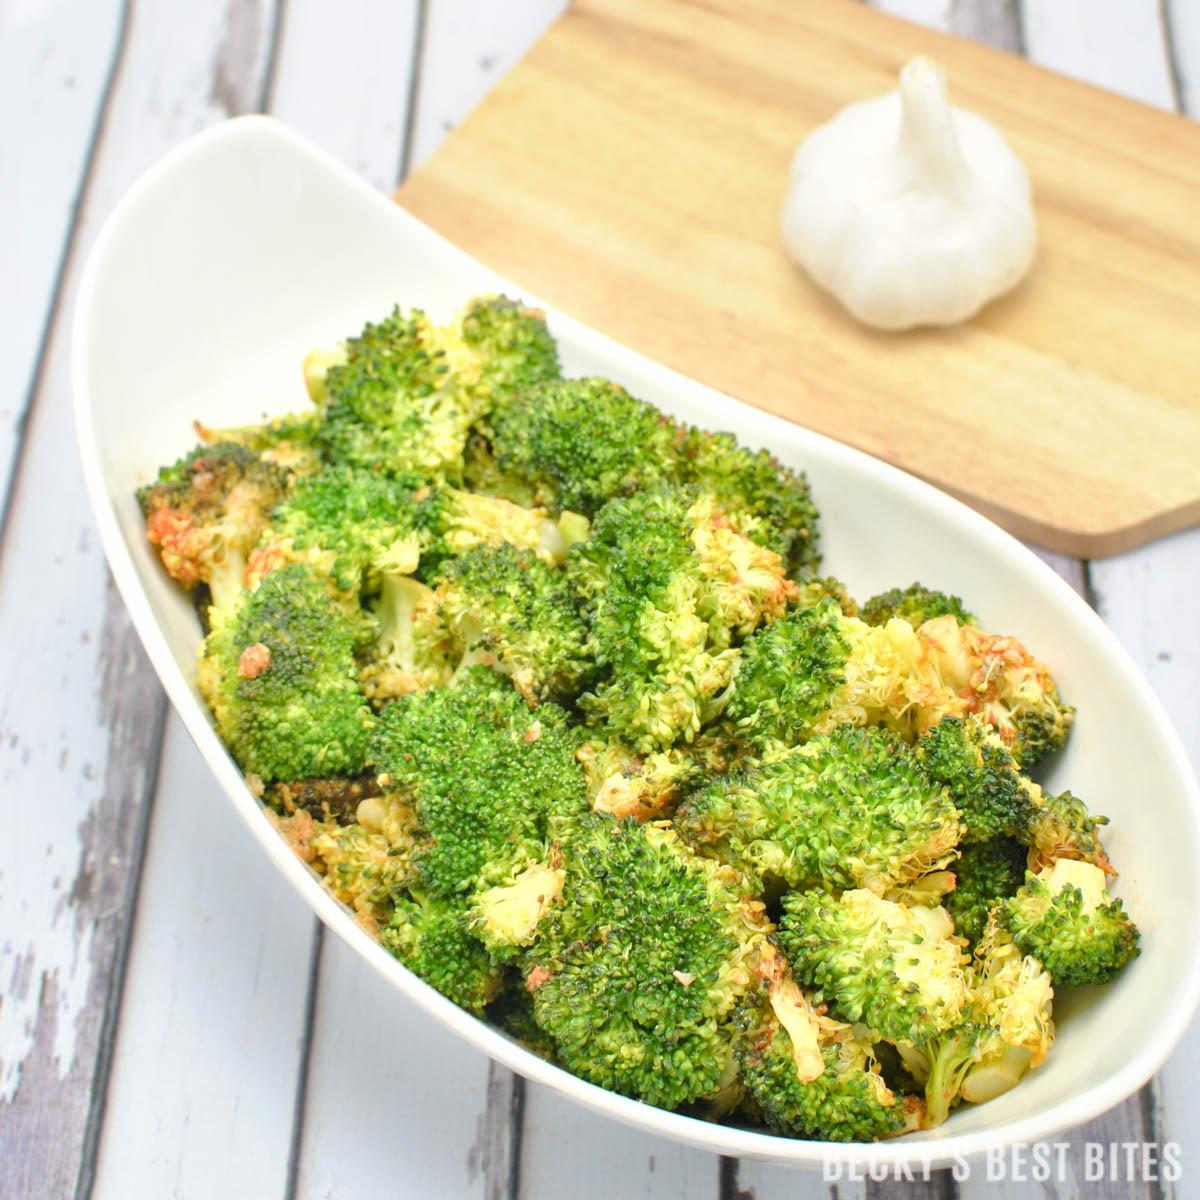 Healthy Broccoli Side Dishes  Roasted Sriracha Broccoli Becky s Best Bites